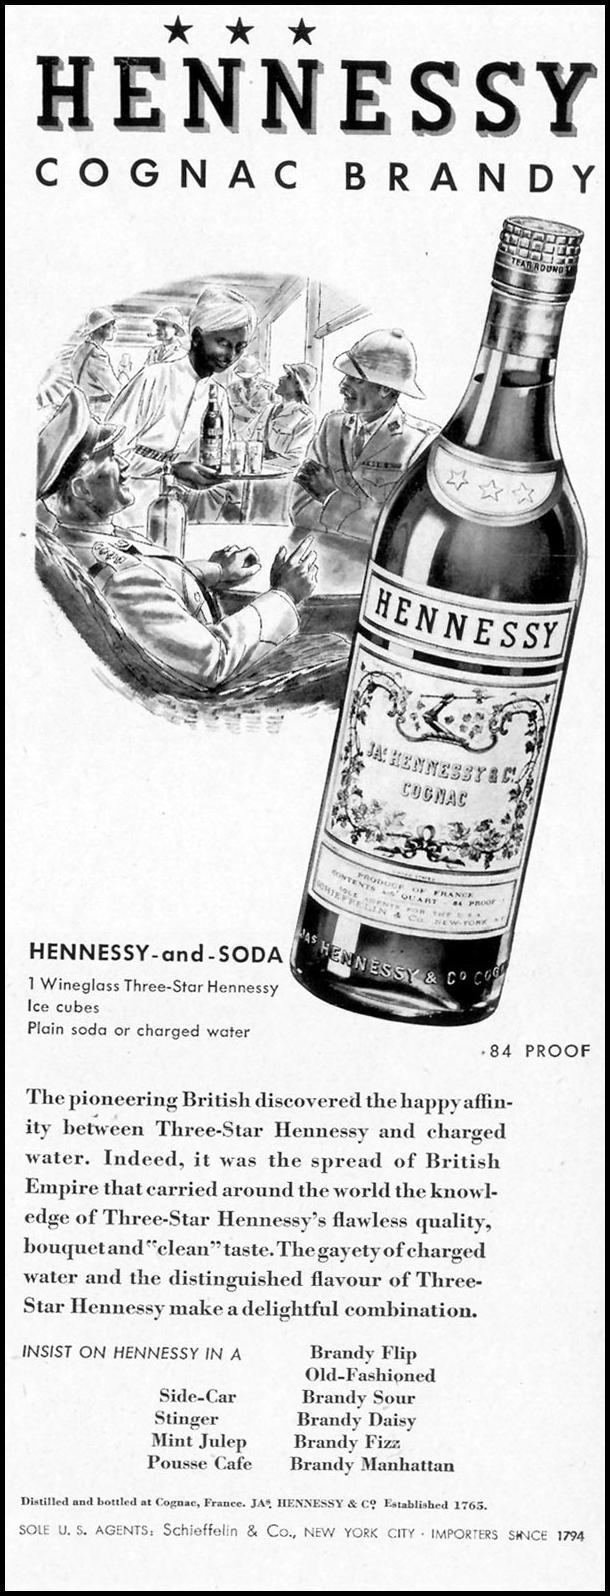 HENNESSY COGNAC BRANDY LIFE 09/13/1937 p. 9